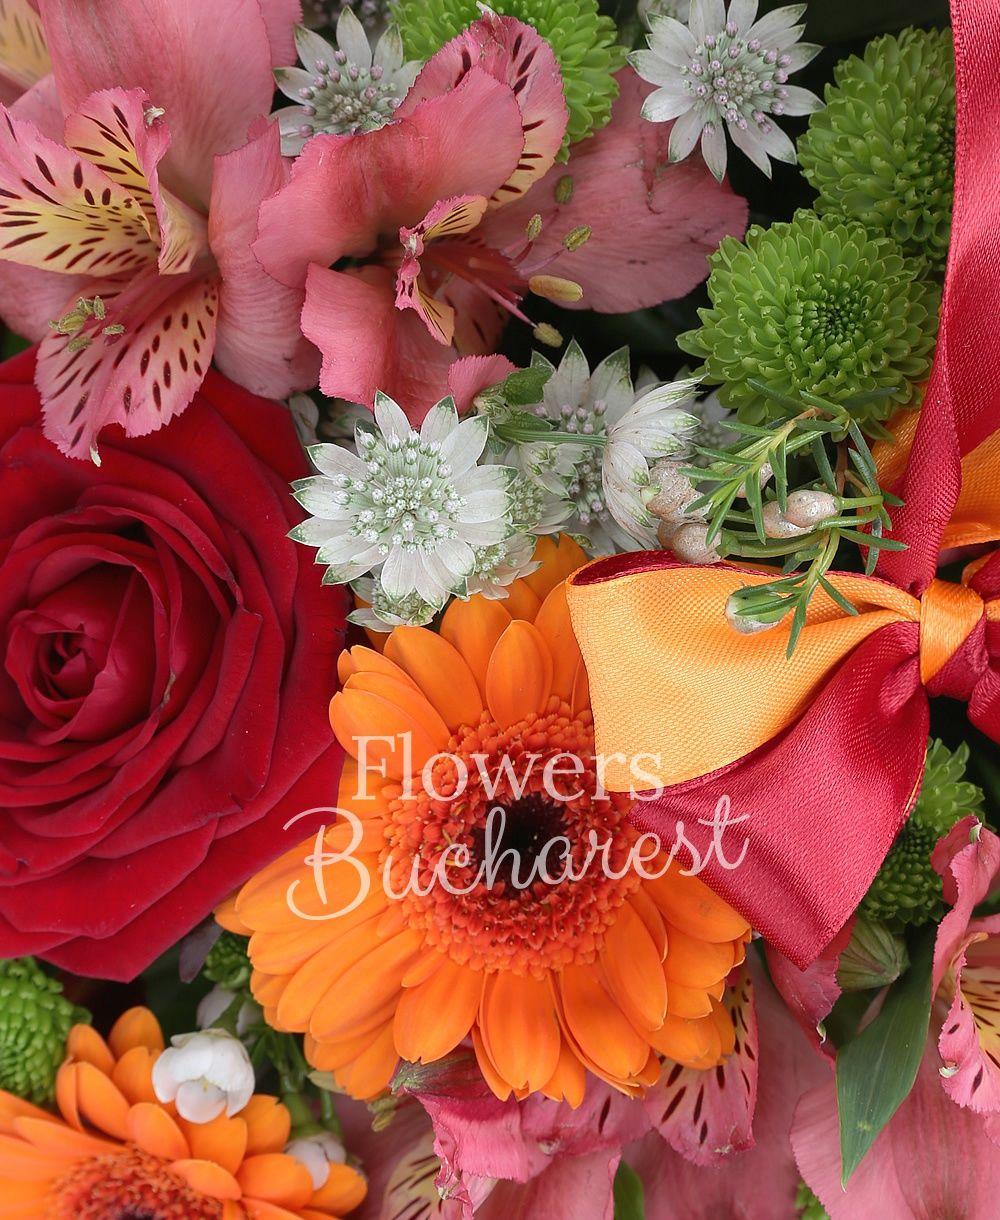 5 red roses, 6 orange gerberas, 3 pink alstroemeria, 3 hypericum, 3 green santini, greenery